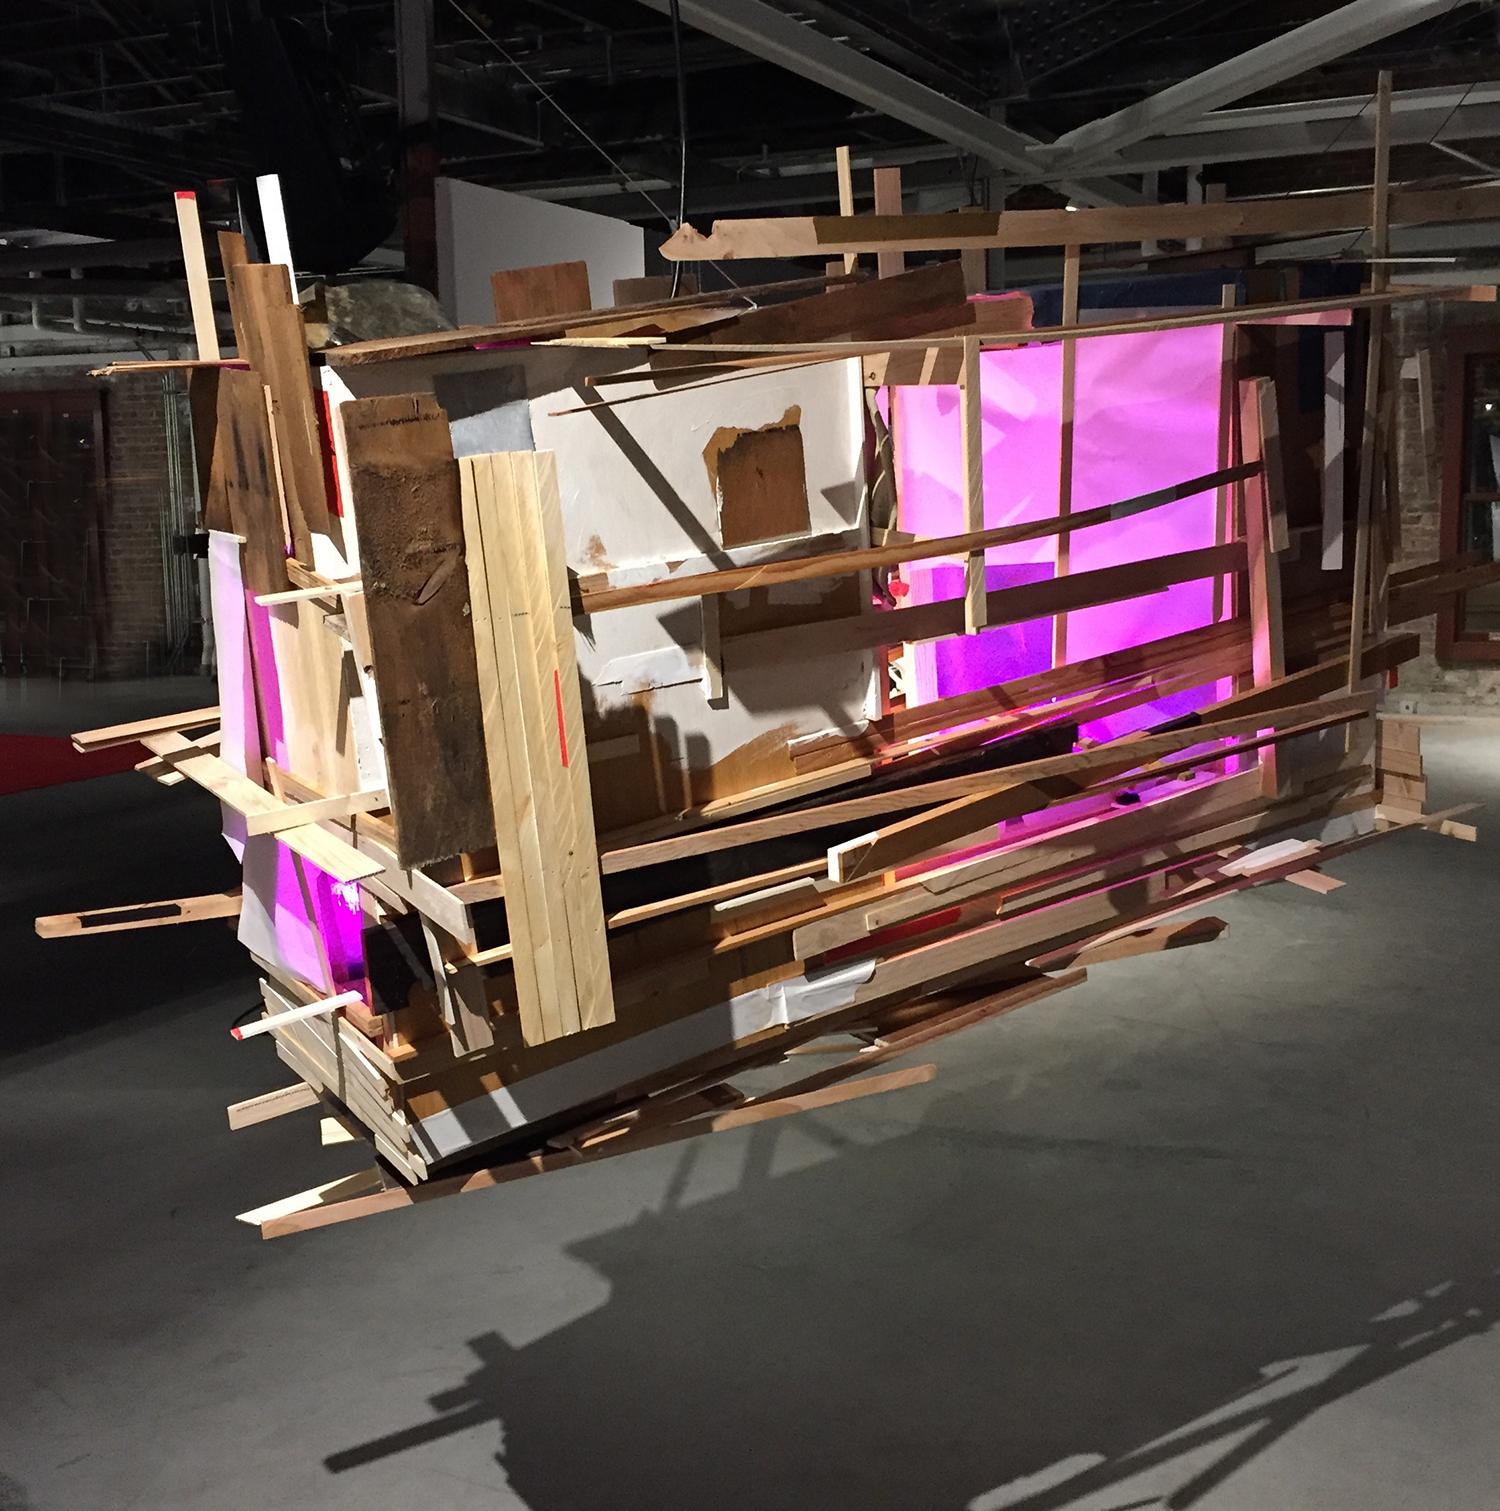 "Bradly Gunn,  Theatrum Orbis Terrarum (Theatre of the World) .Lumber, vellum, paint, tape and fluorescent light,72""L x 29""W x 60""H,2016"